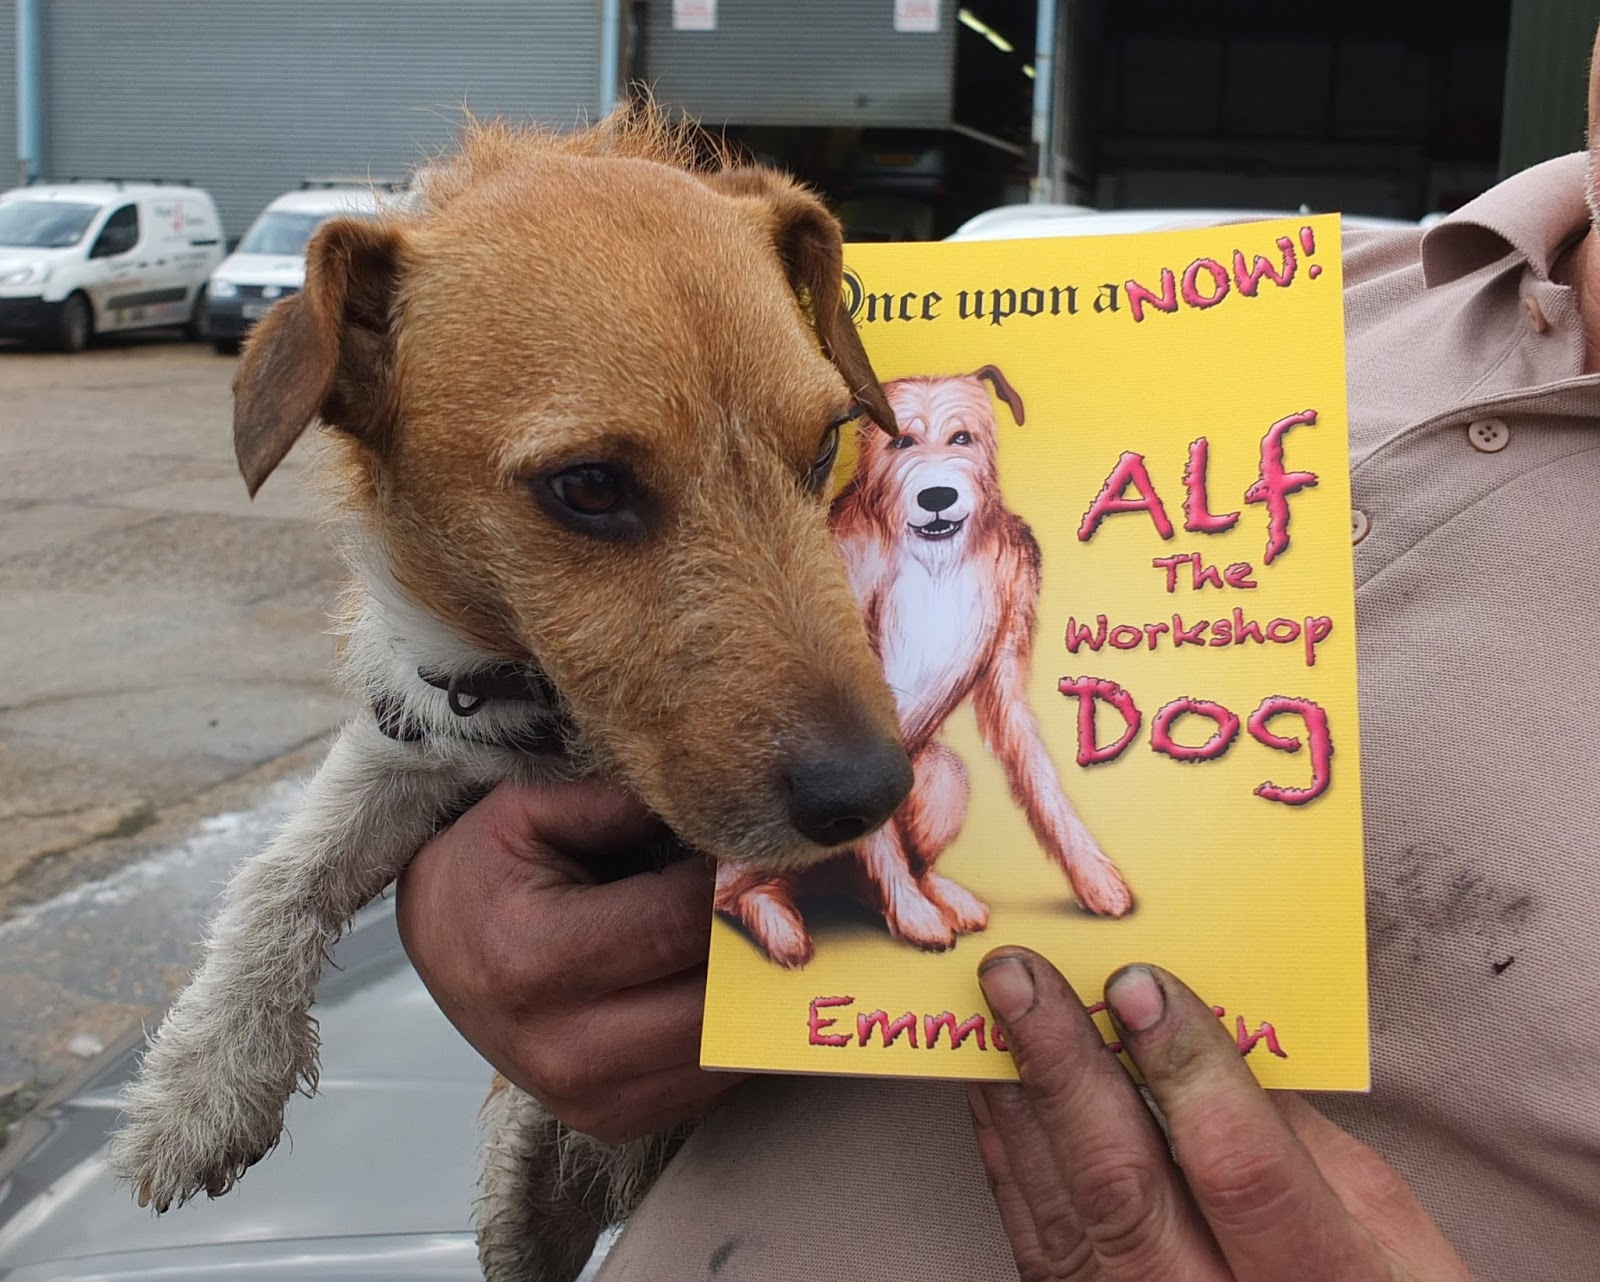 Alf The workshop dog, Alf, Dog, Children's fiction, paperback book, kid's books